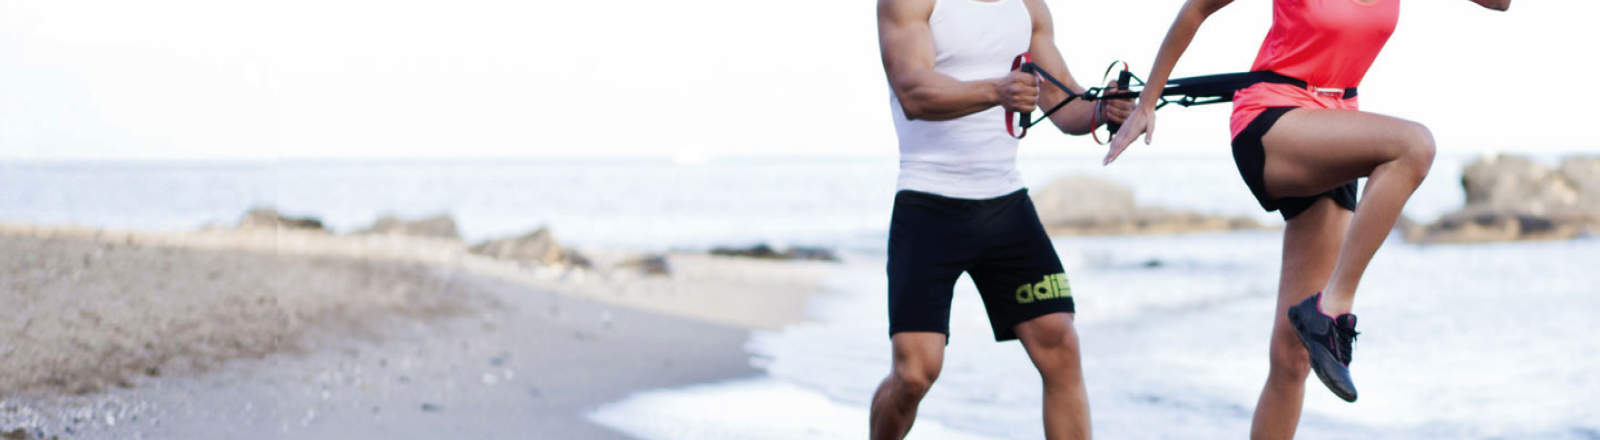 rendimiento deporte fisioclinics bilbao